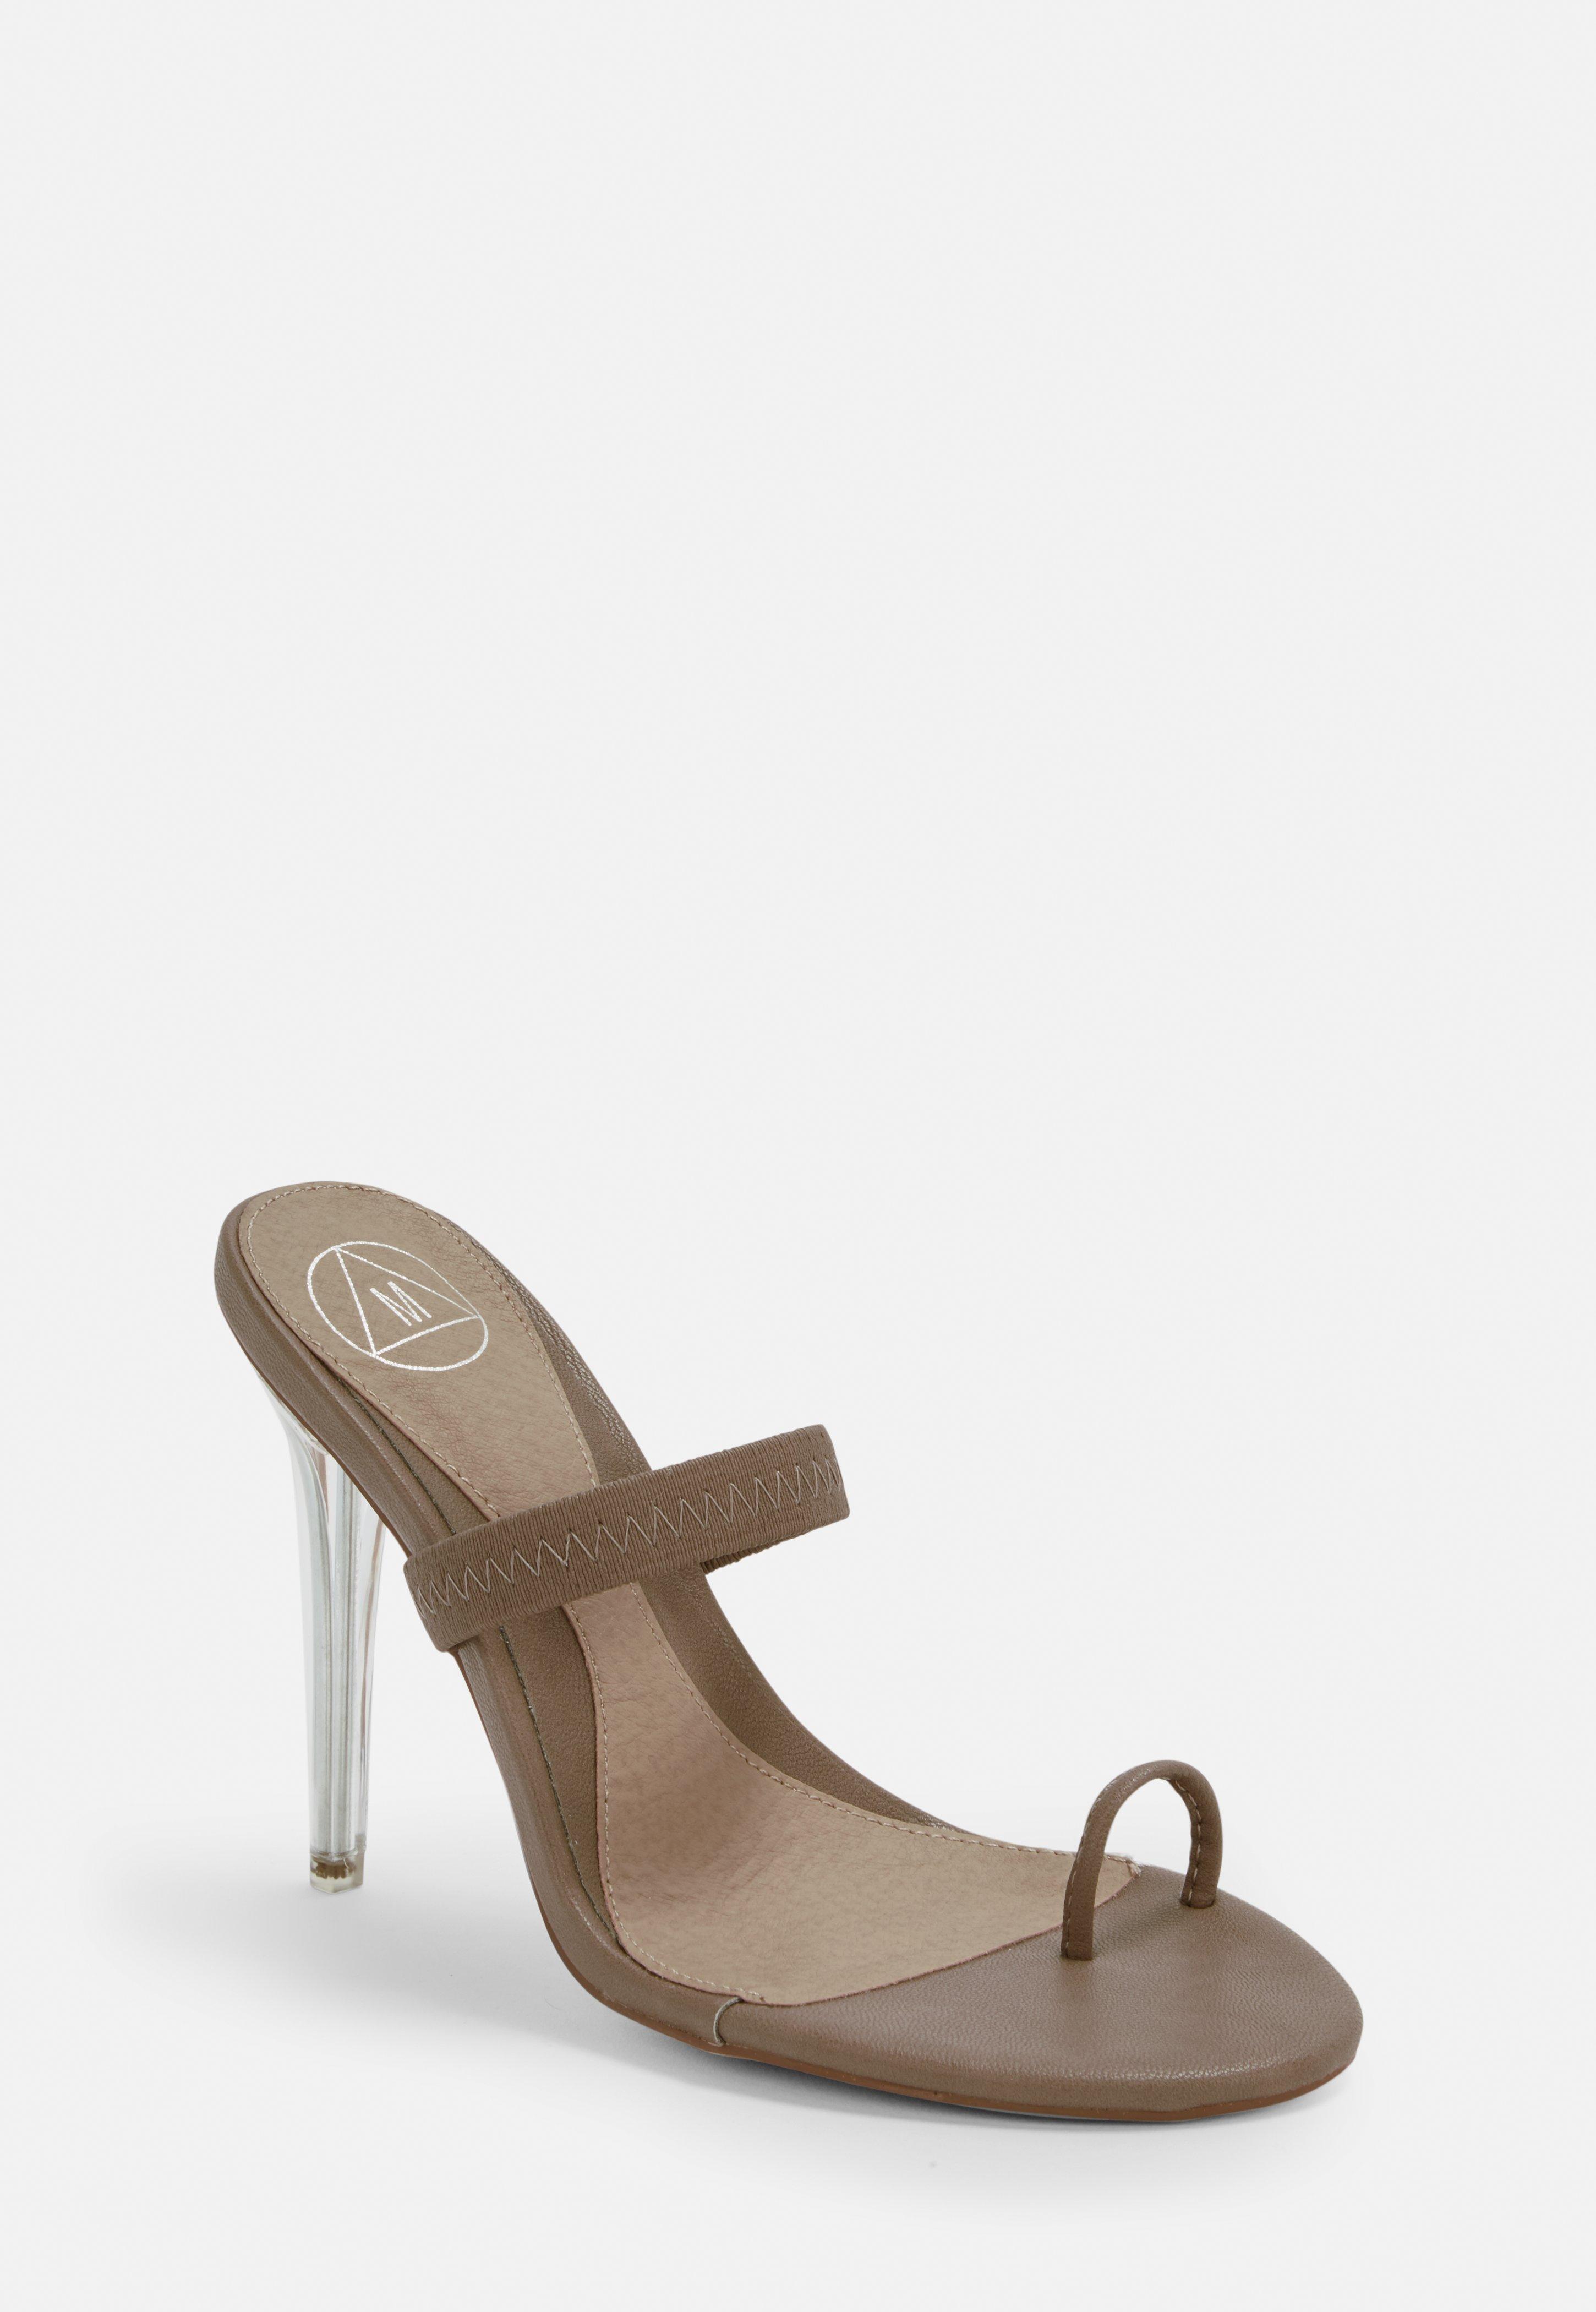 660bbcb1a74 Clear Heels - Shoes